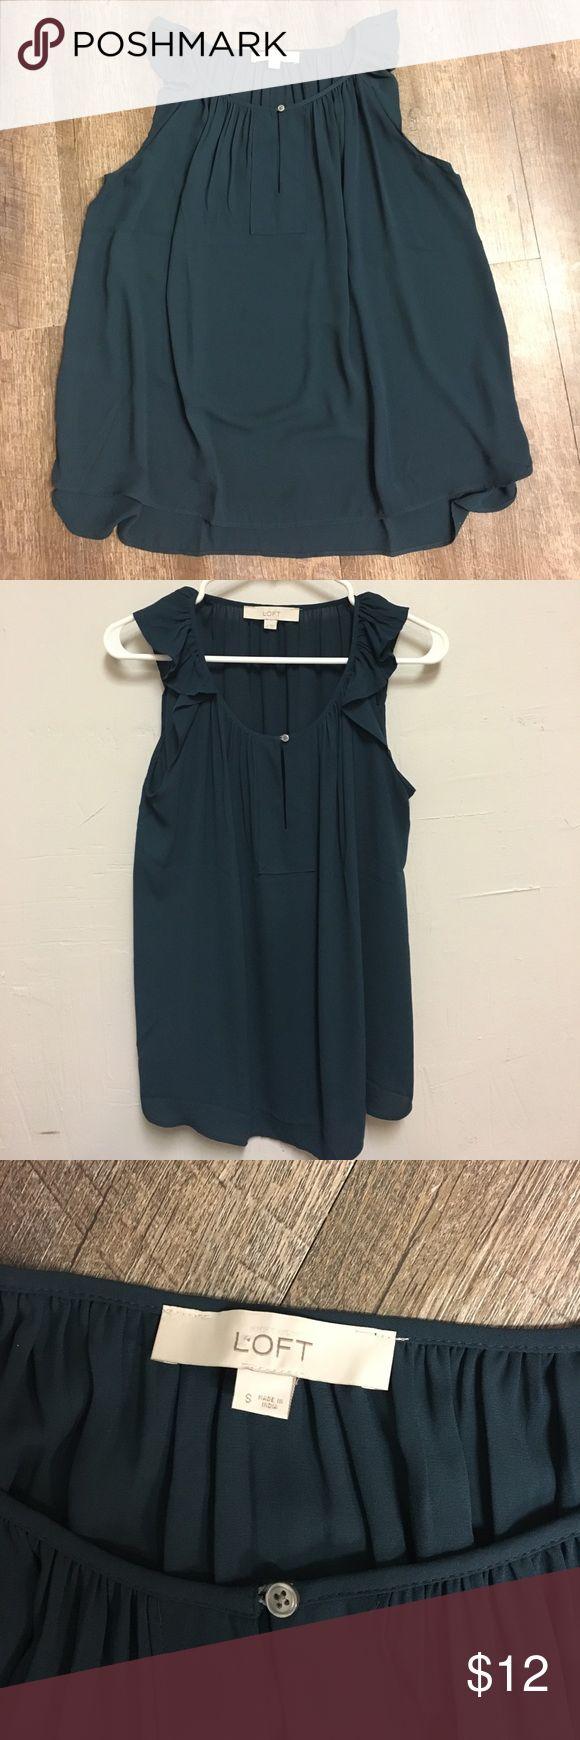 Loft (Ann Taylor Co) sleeveless top. Loft (Ann Taylor Co) dark teal, small, sleeveless top. LOFT Tops Blouses